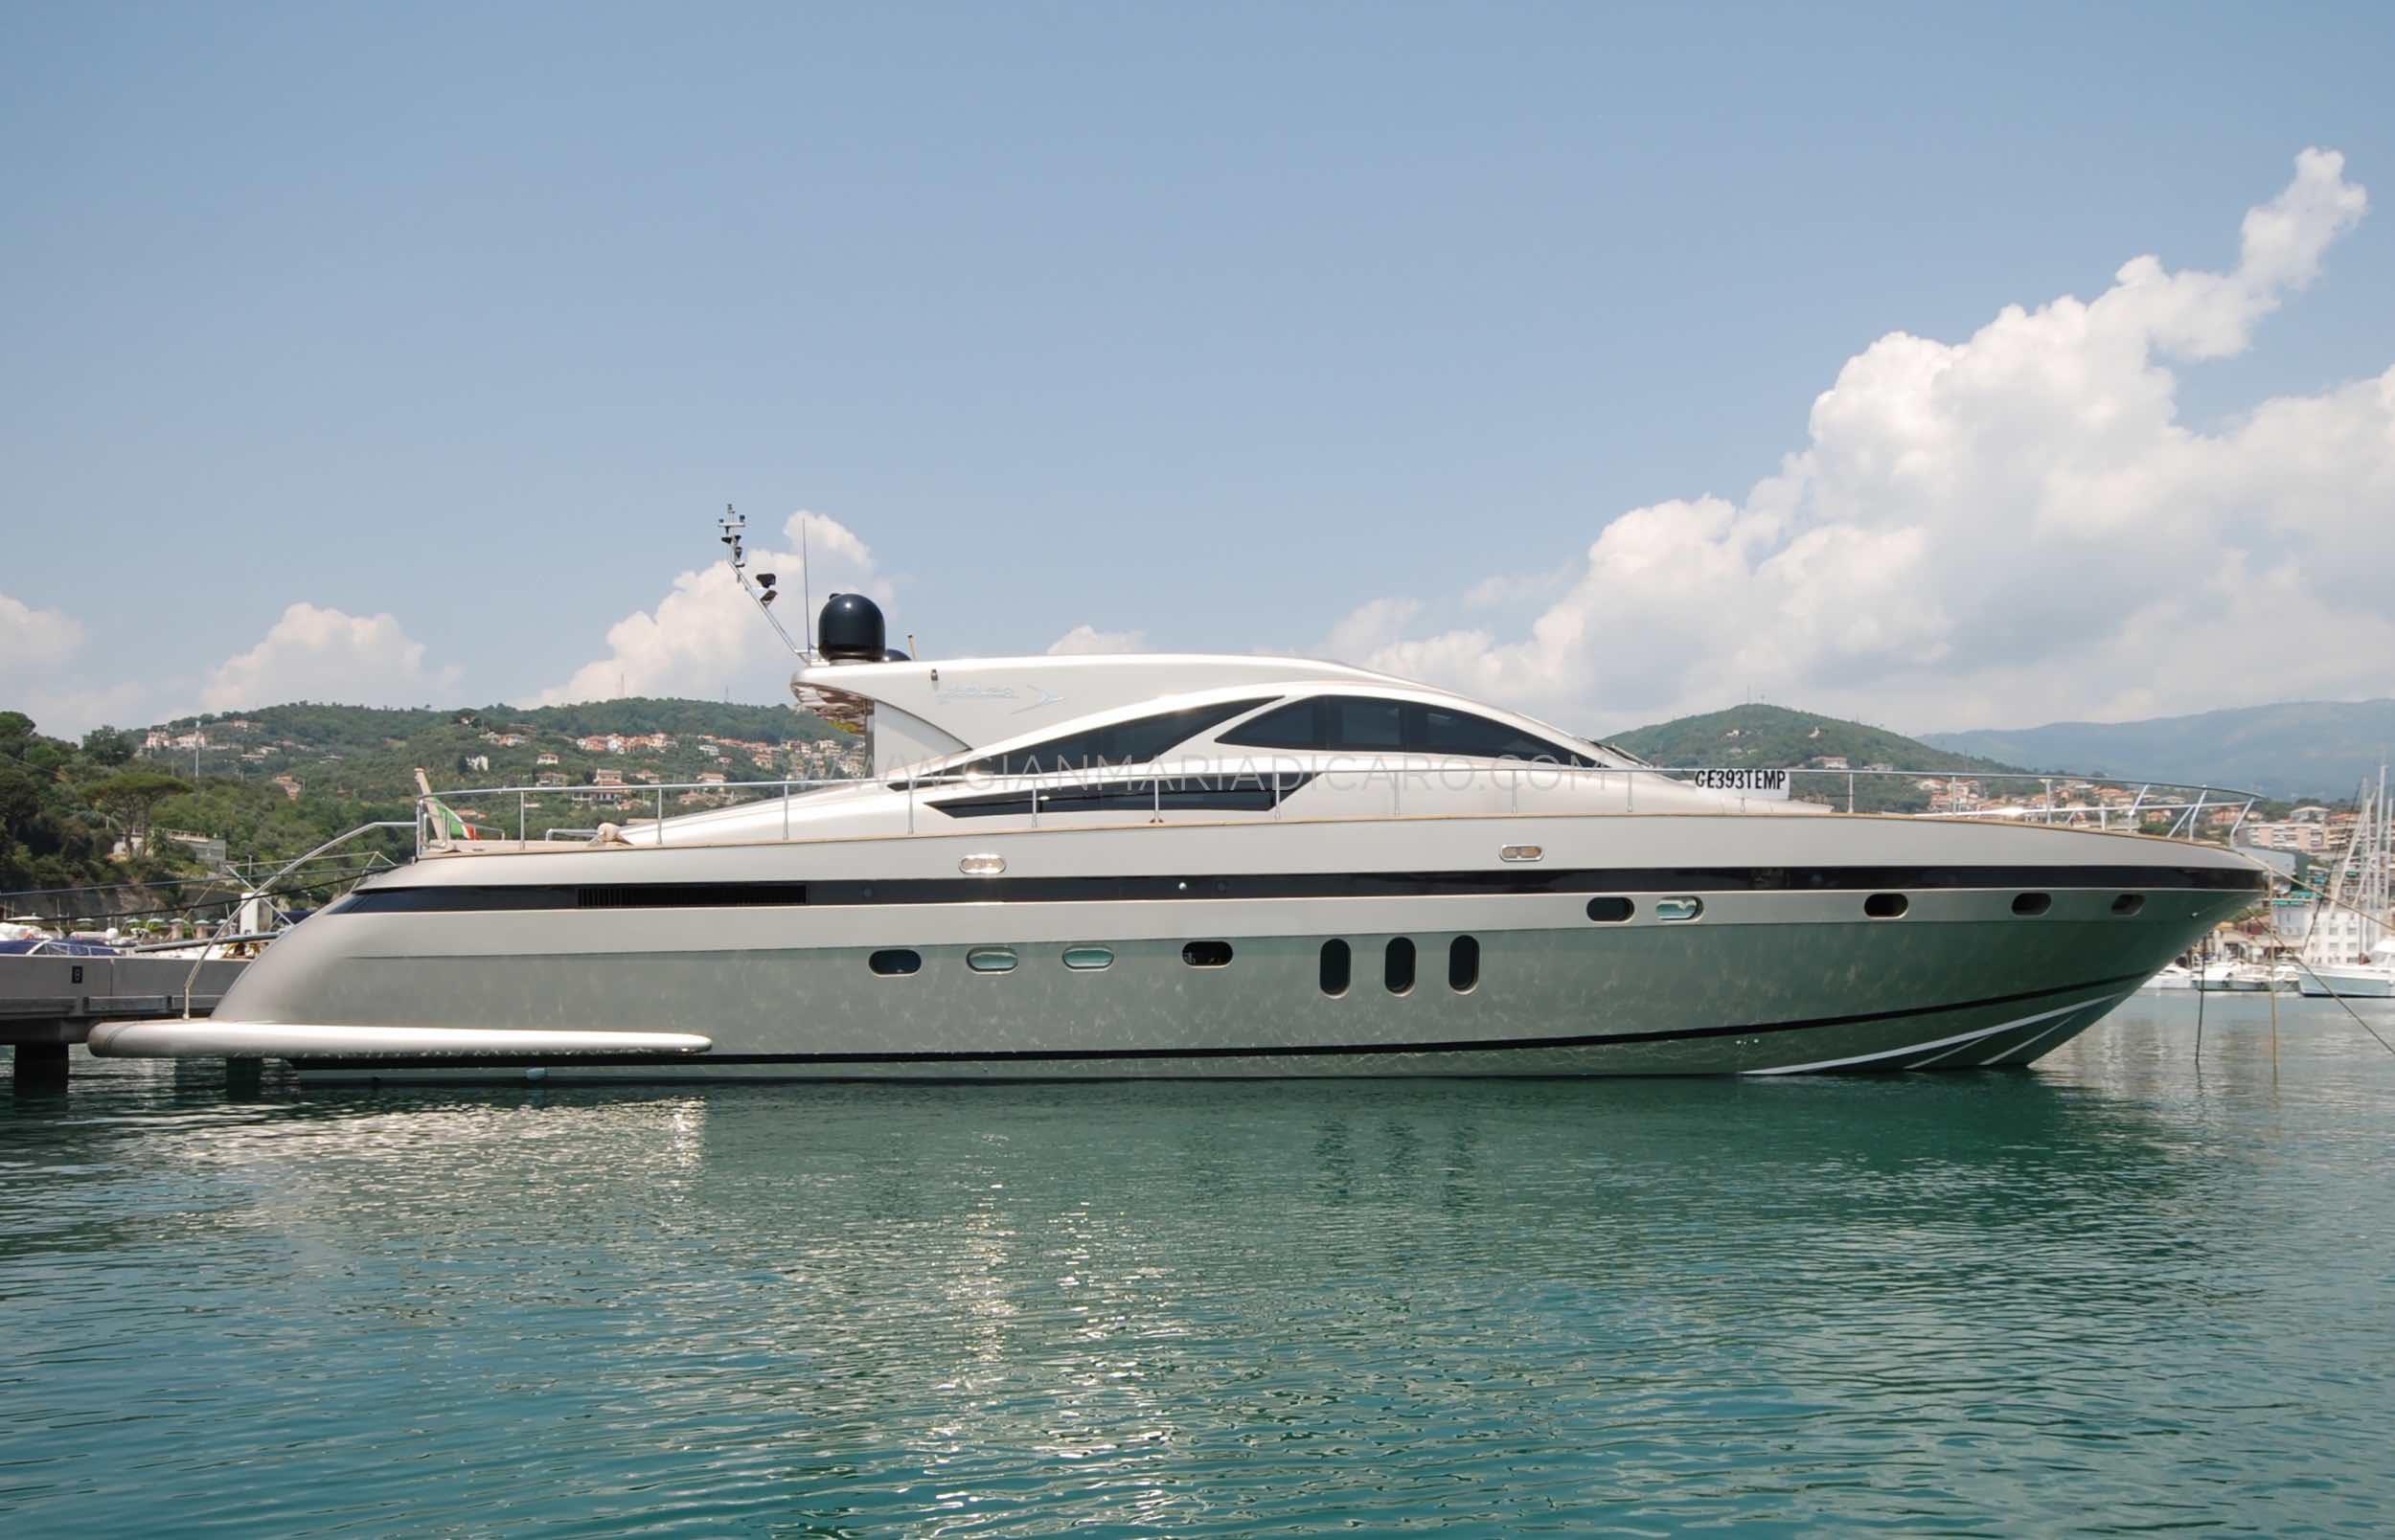 italian-yachts-jaguar-80-miss-11-for-sale-2.jpg